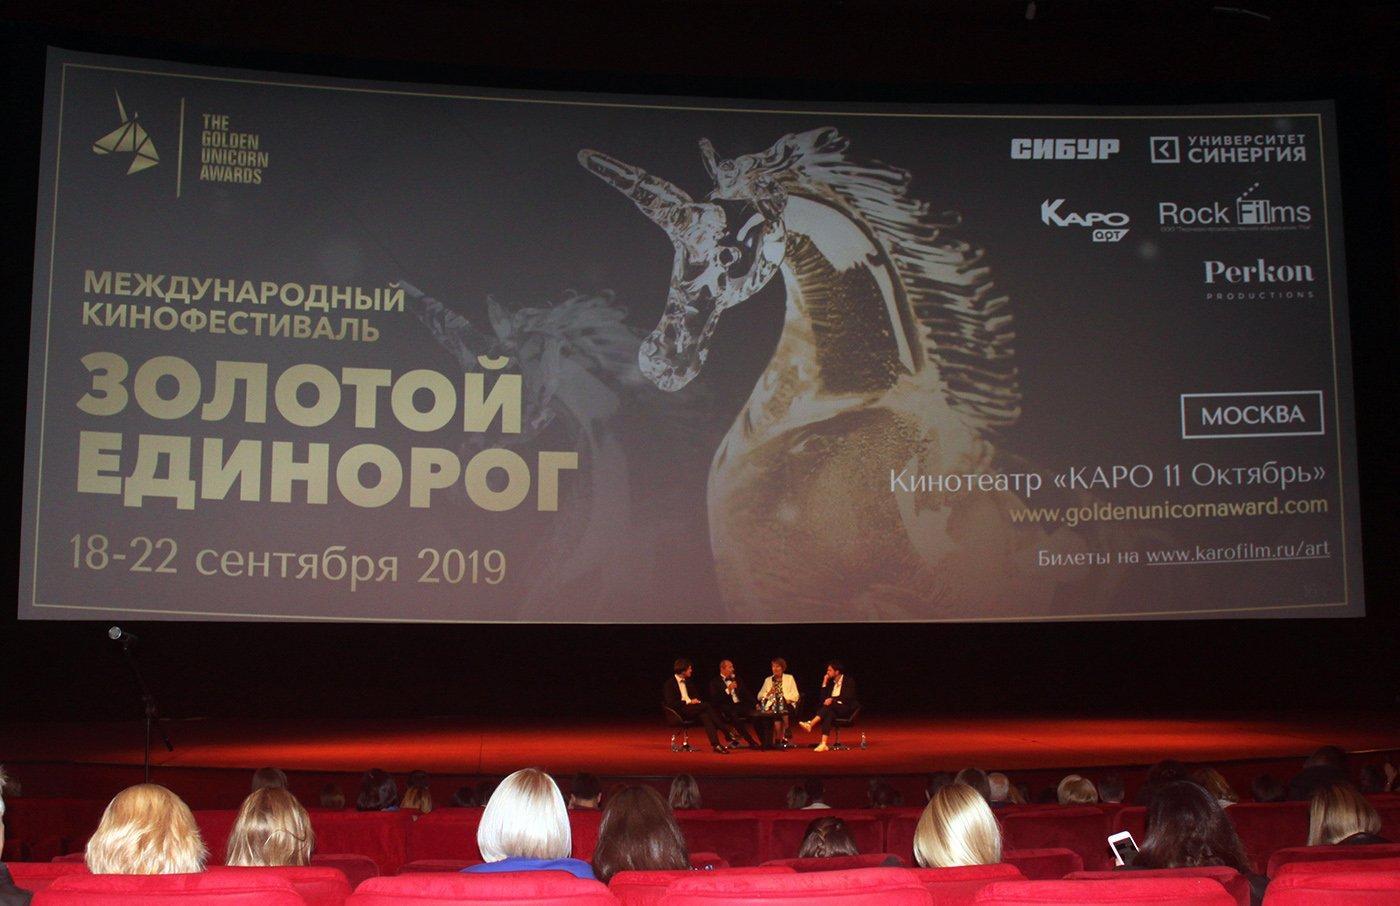 "La película cubana ""Serguio y Serguéi"" mereció el primer premio a una cinta extranjera sobre tema ruso en el Festival Golden Unicorn."